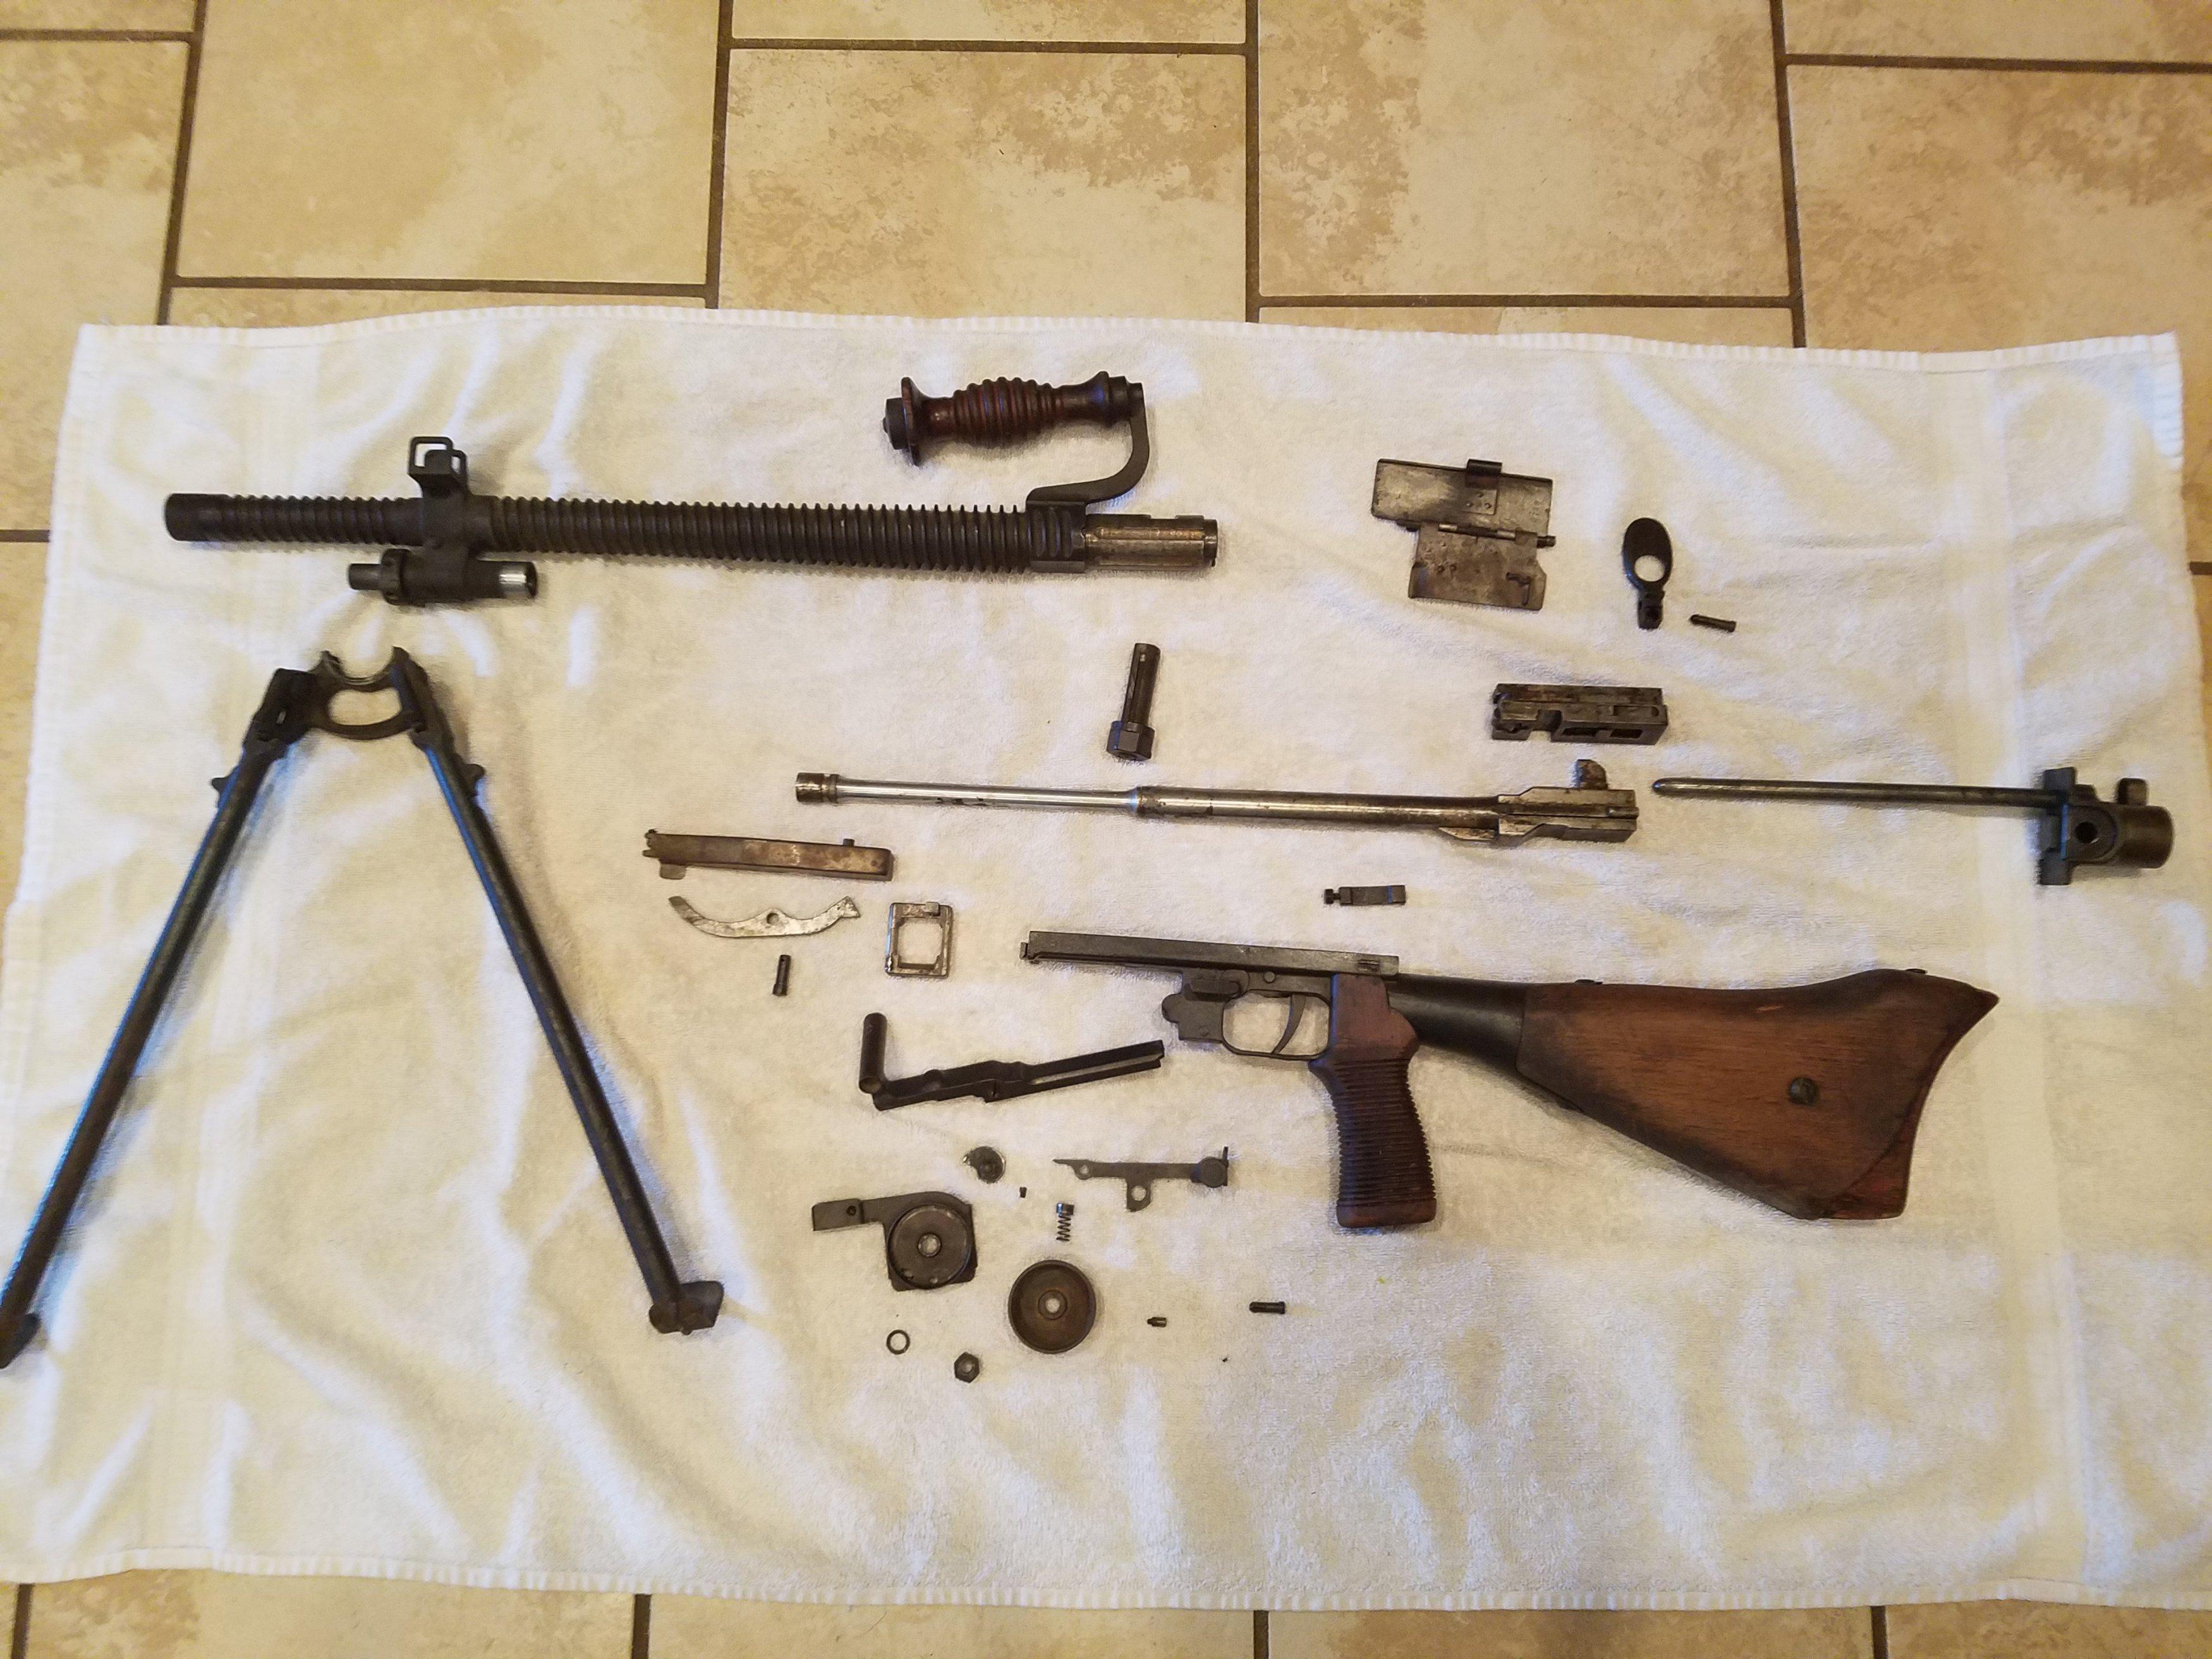 WTS: Type 99 LMG Parts Kit, 14 5